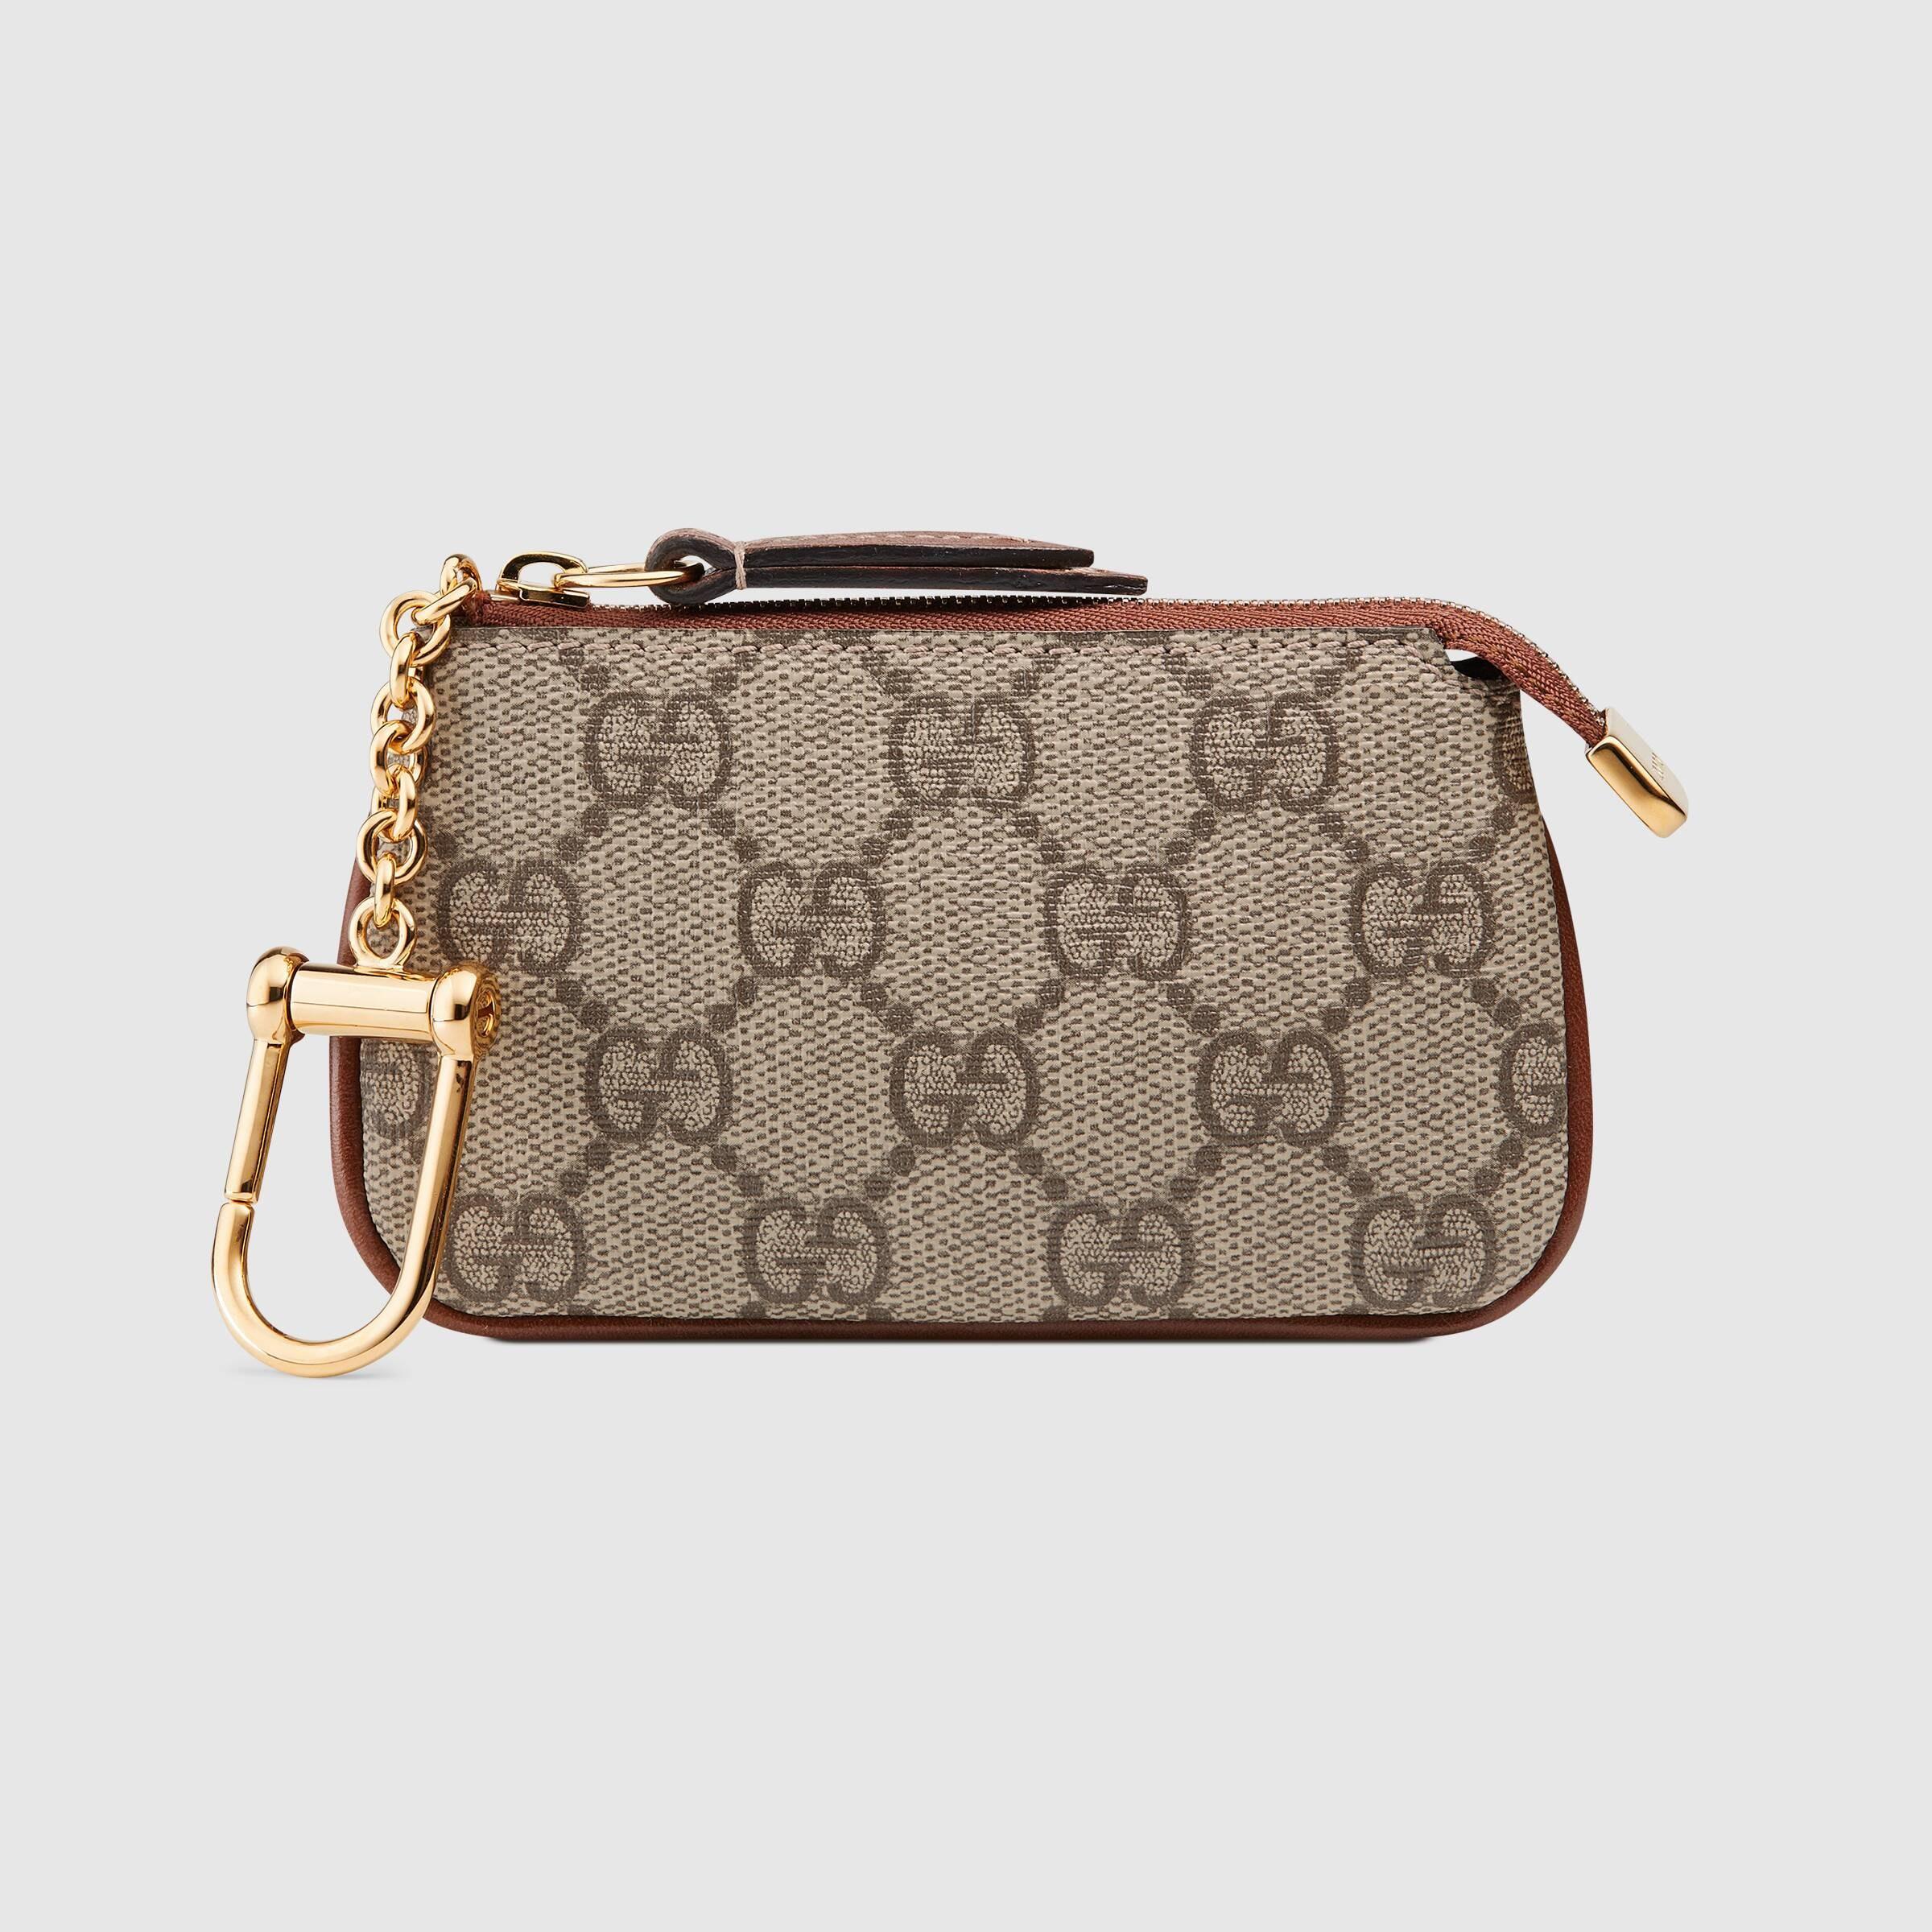 Gucci GG Supreme key case 447964 KLQHG 8526